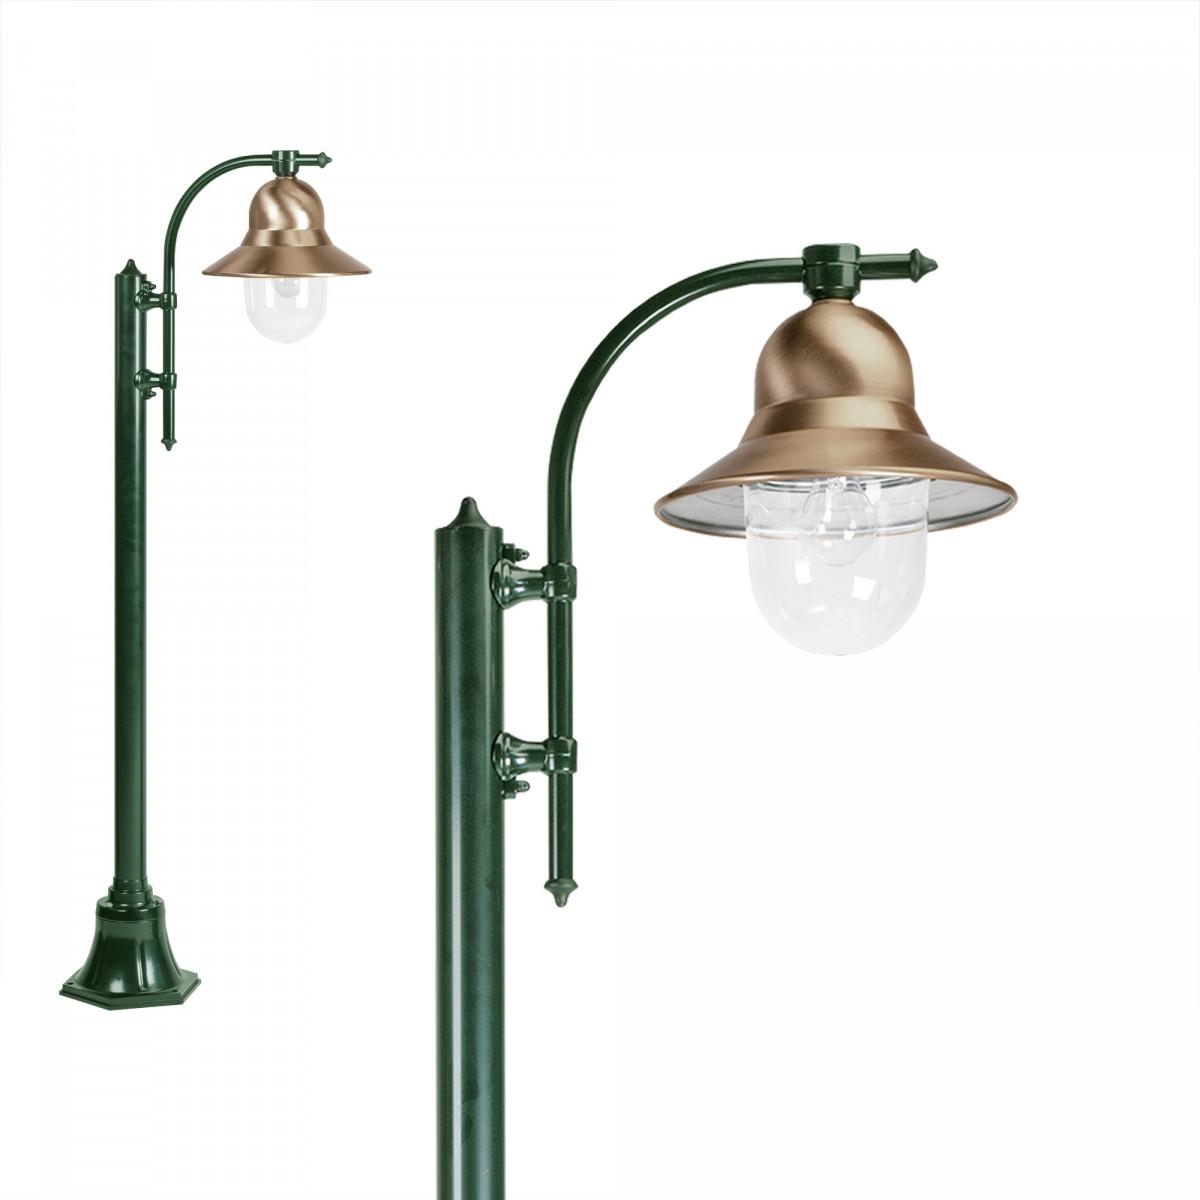 Tuinlamp Toscane Lantaarn